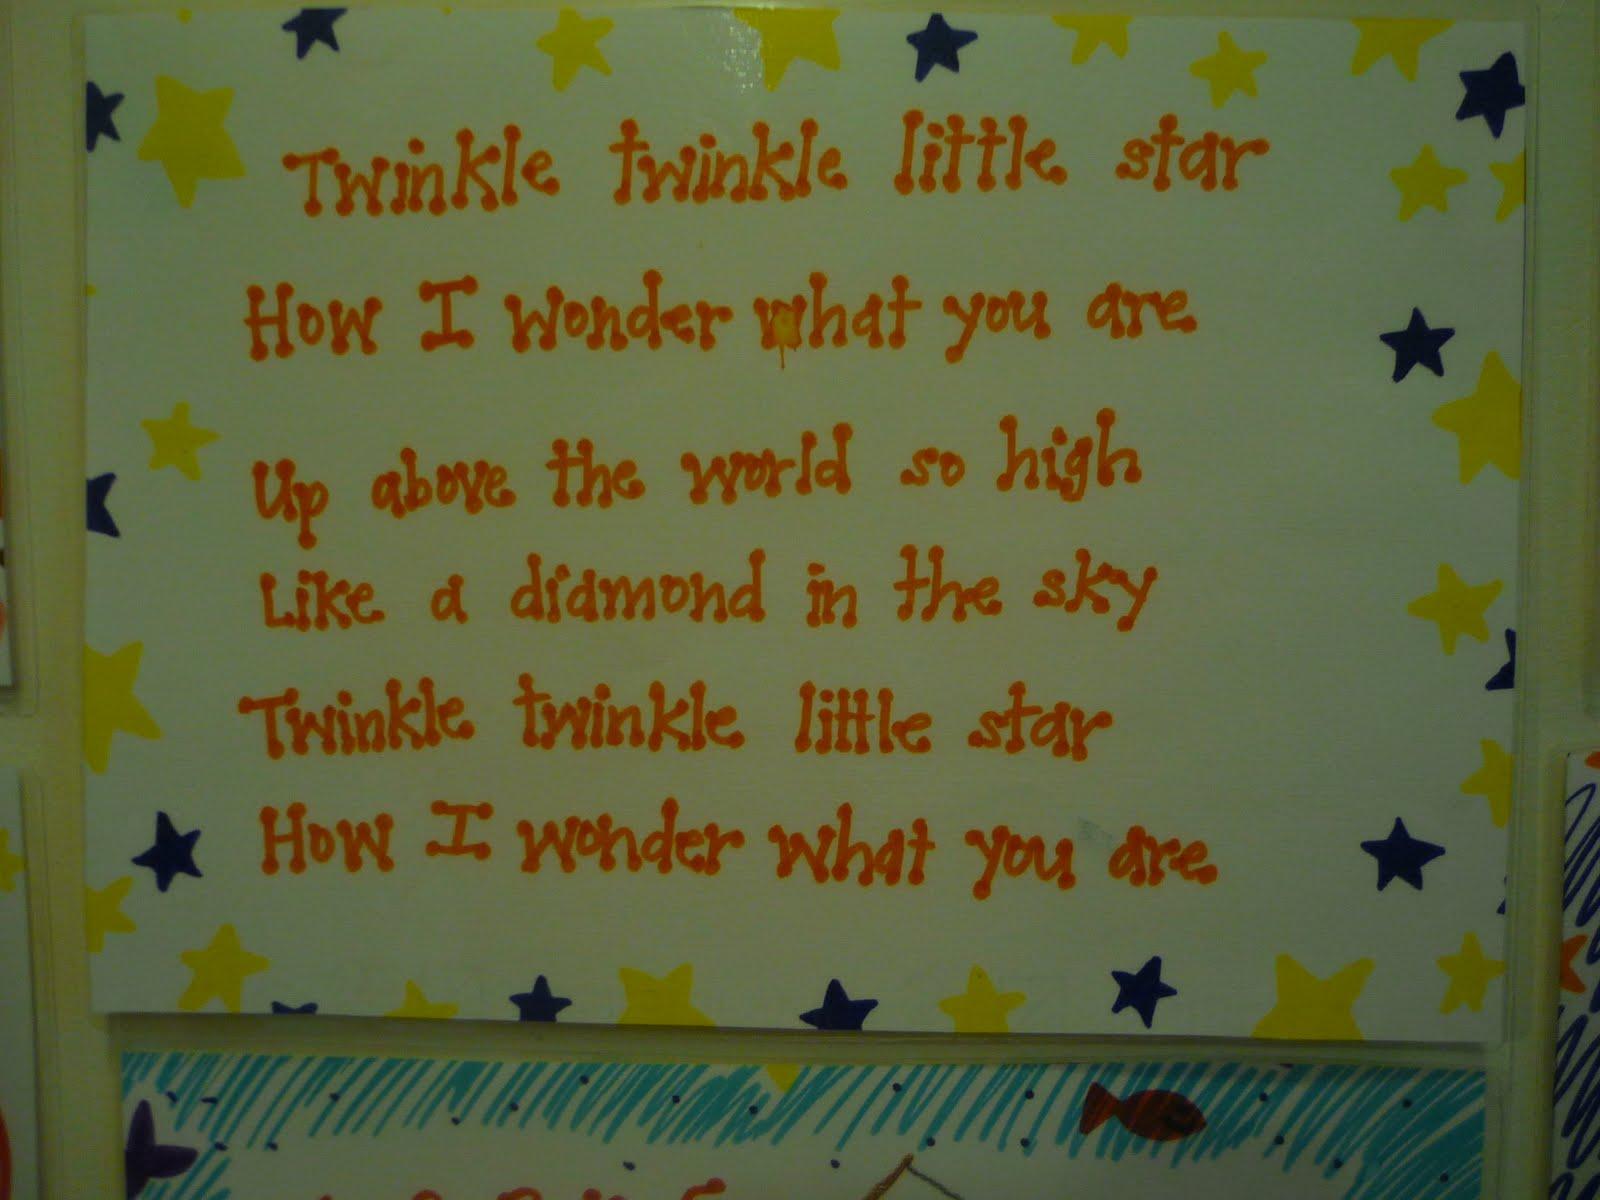 Twinkle Twinkle - The Imagination Tree